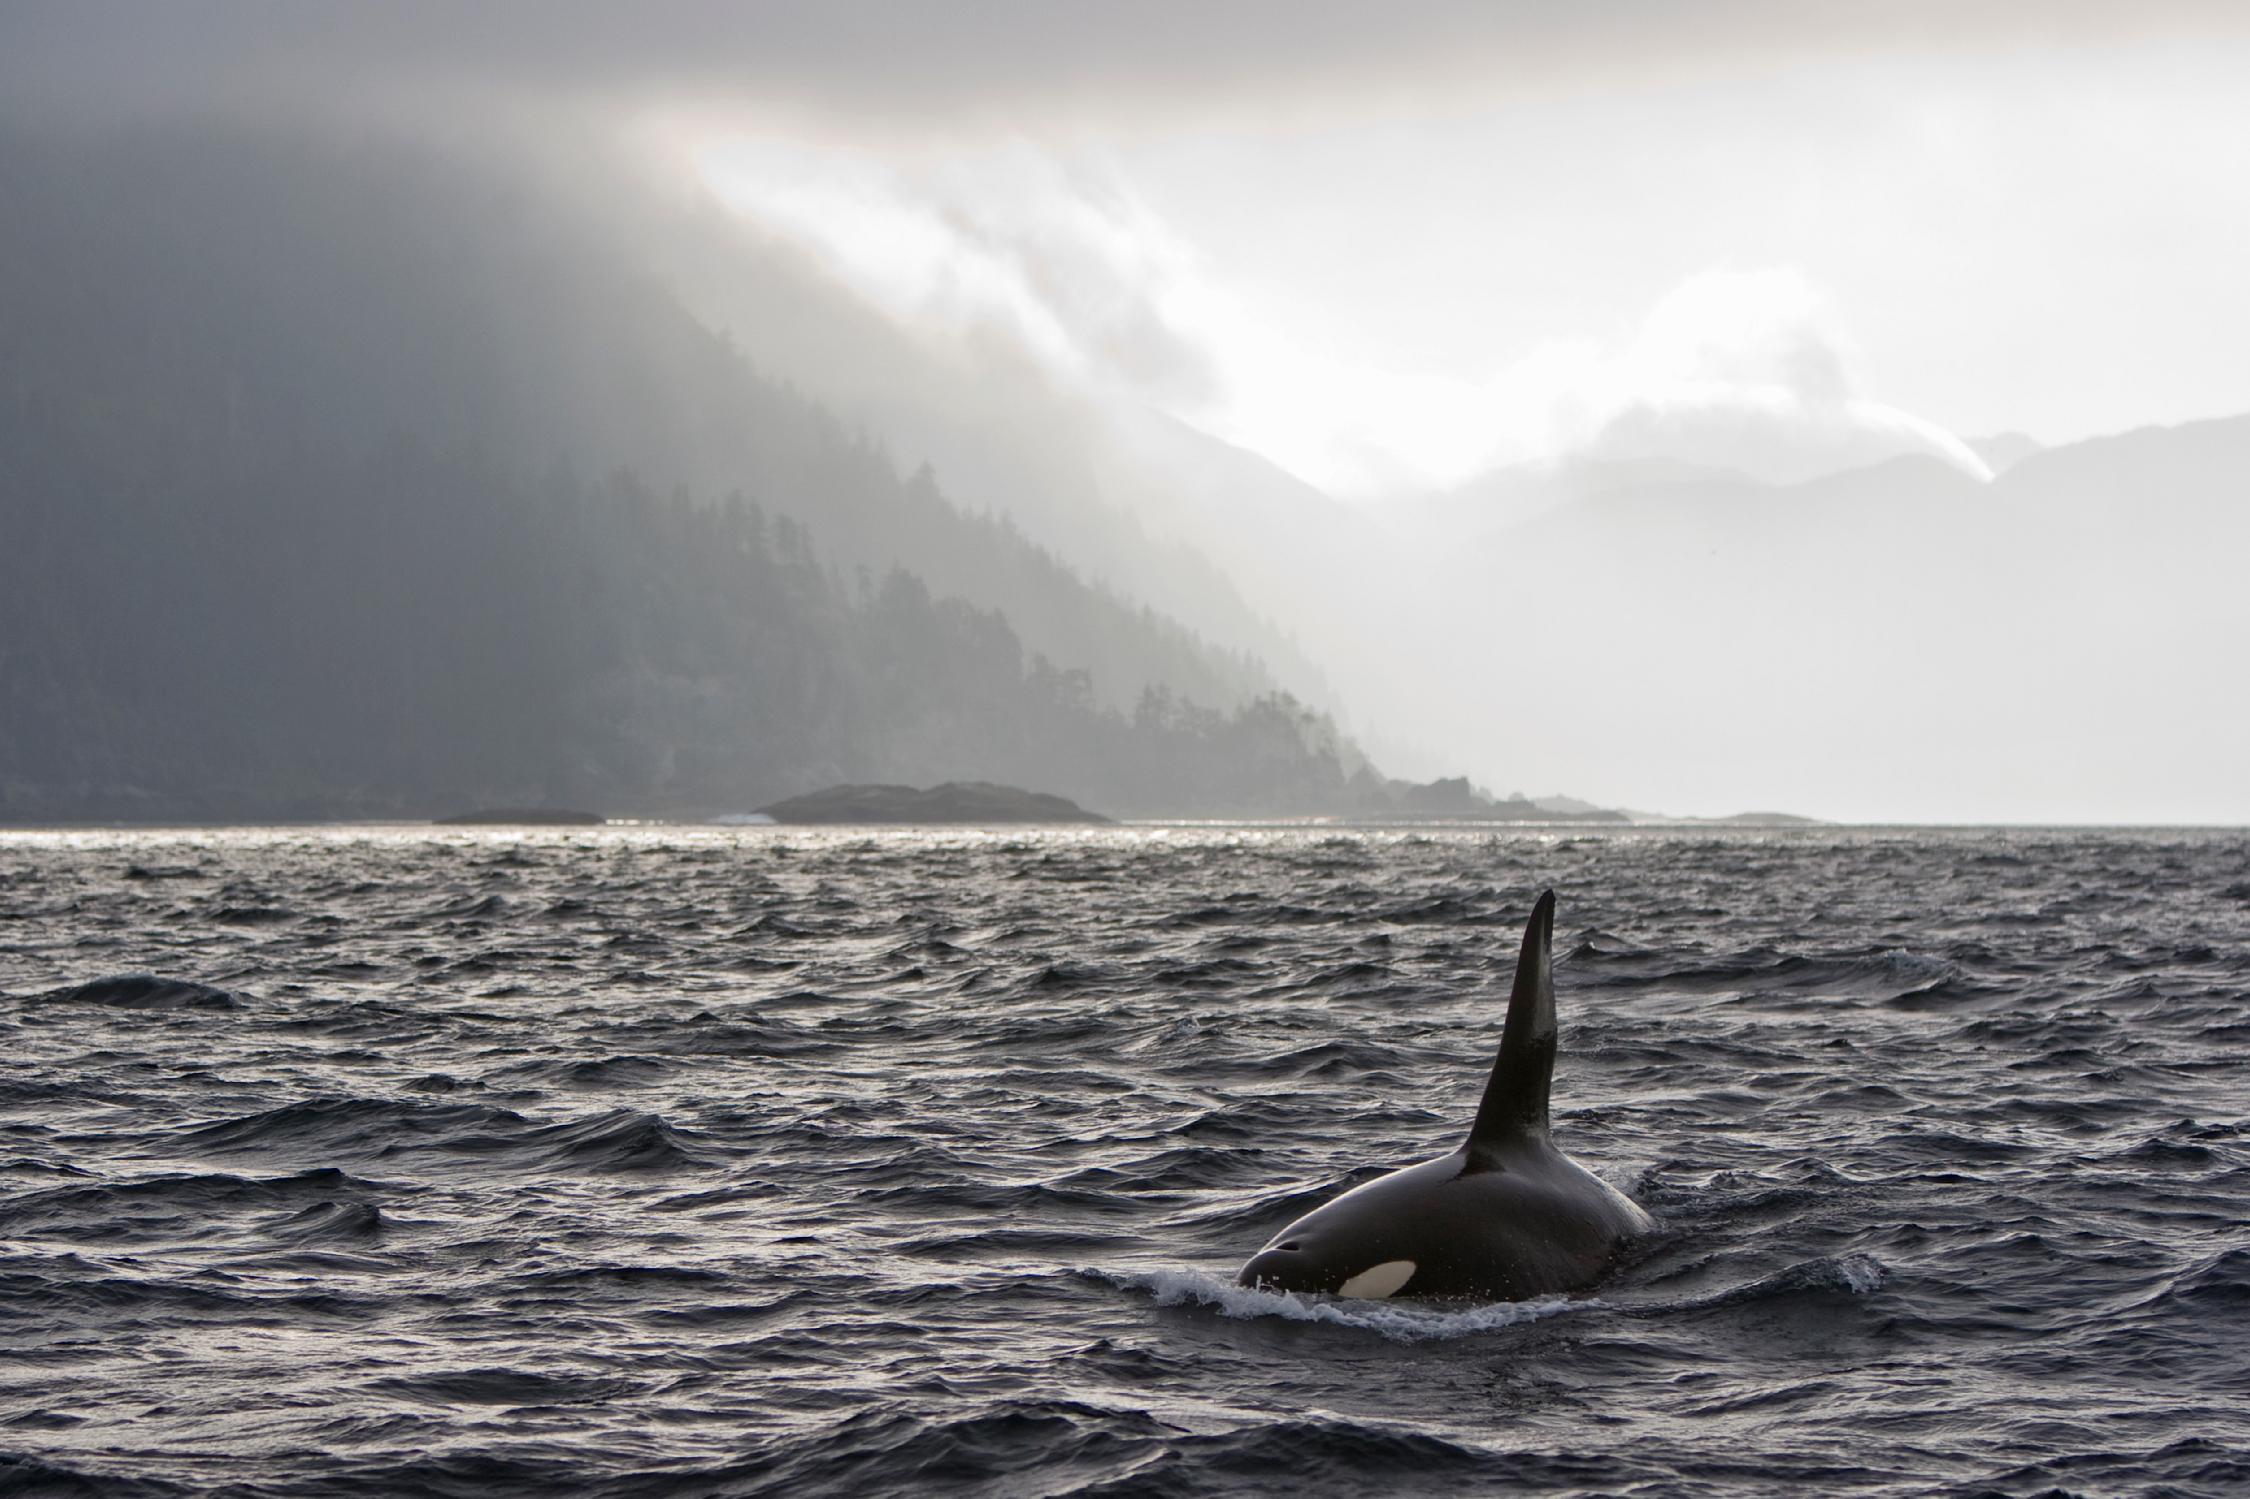 Orca swimming off Queen Charlotte Islands, British Columbia, Canada